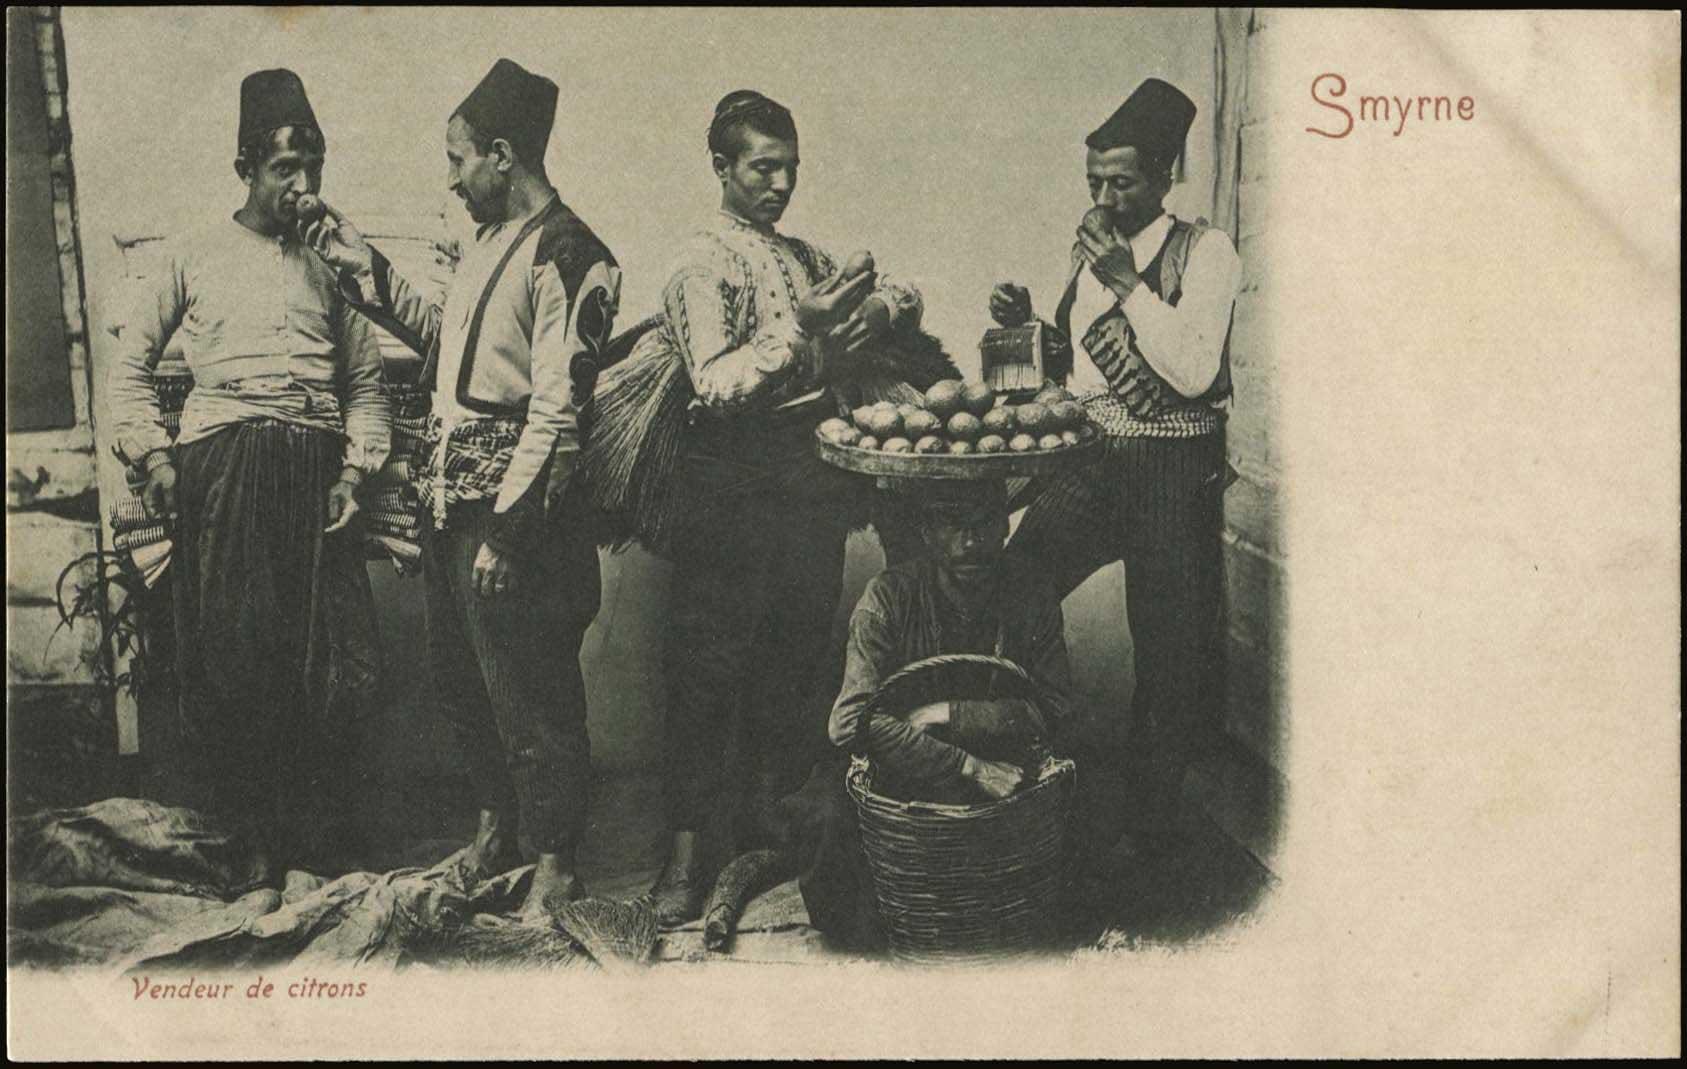 Lot 2108 - -  PICTURE POSTCARDS SMYRNE, CONSTANTINOPLE, ASIA MINOR -  A. Karamitsos Public Auction 635 General Stamp Sale